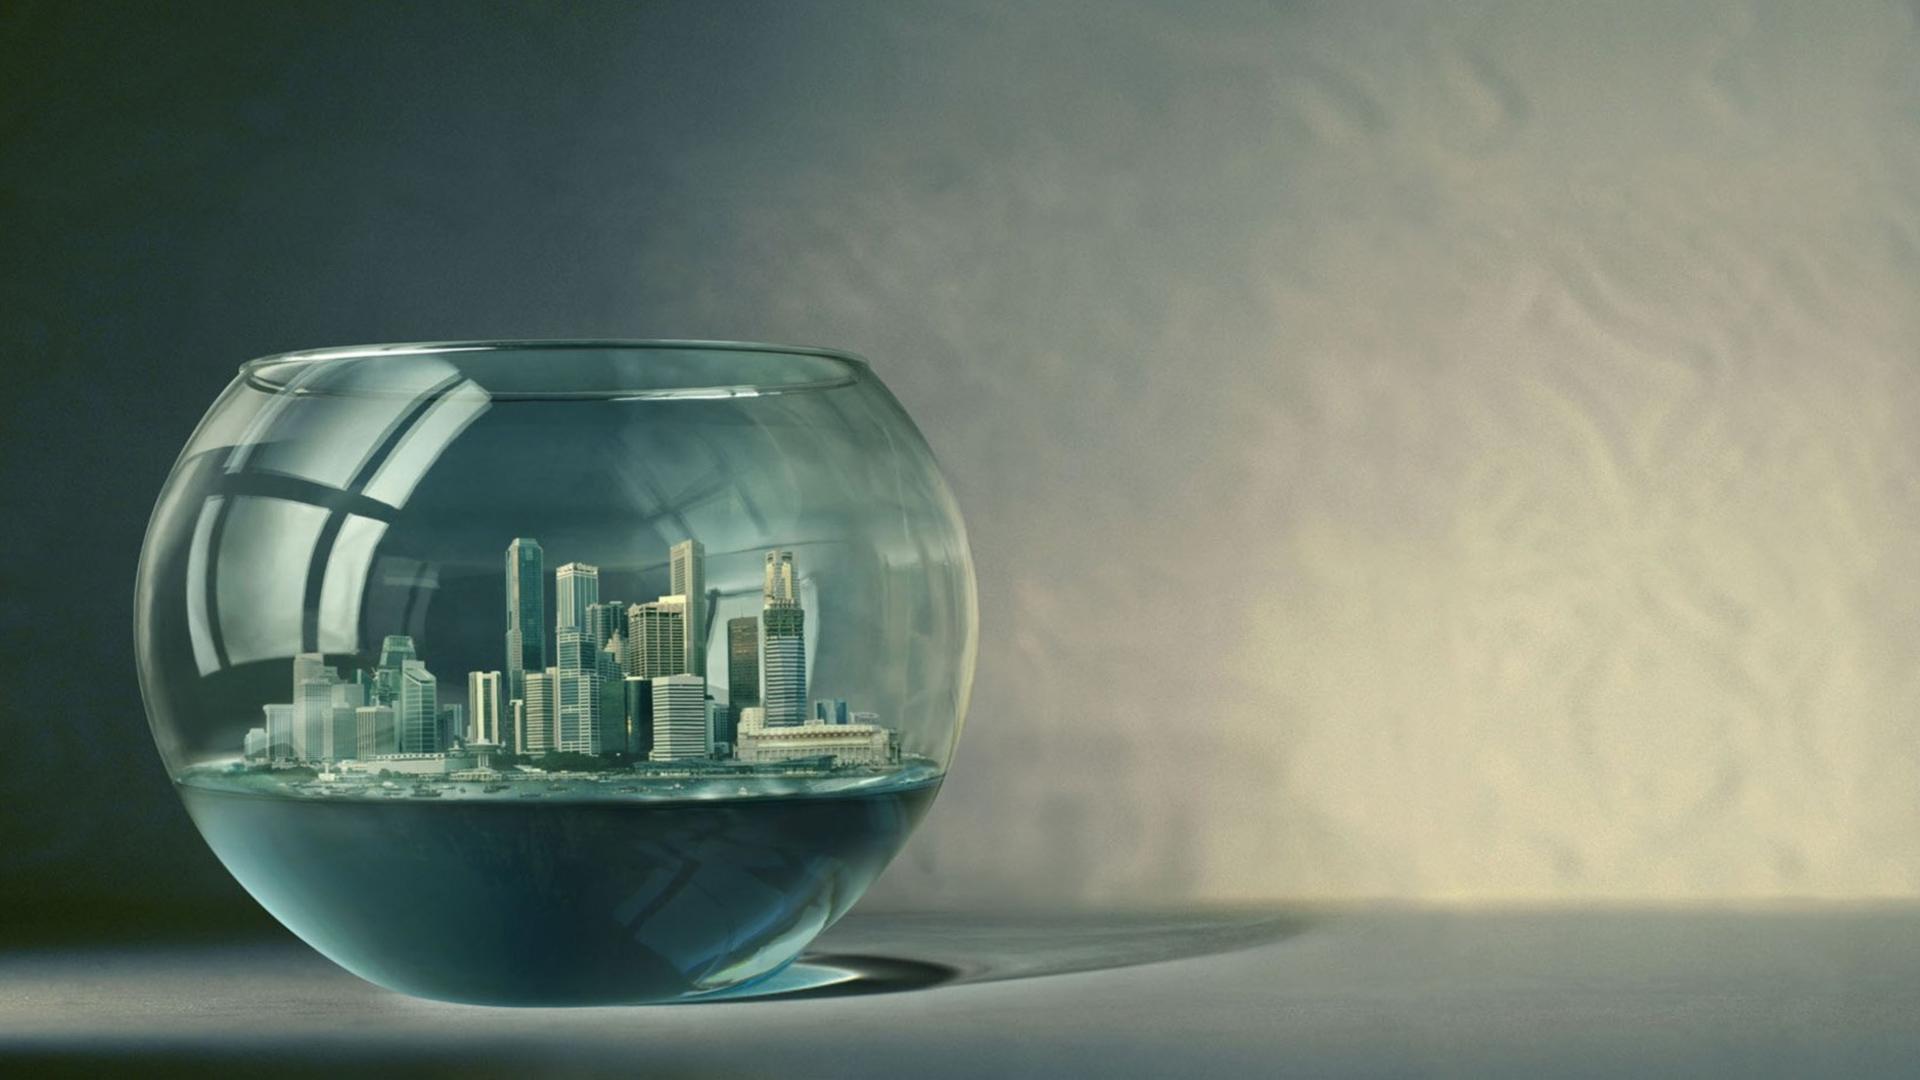 creative-city-buildings-water-bowl-hd-wallpapers.jpg